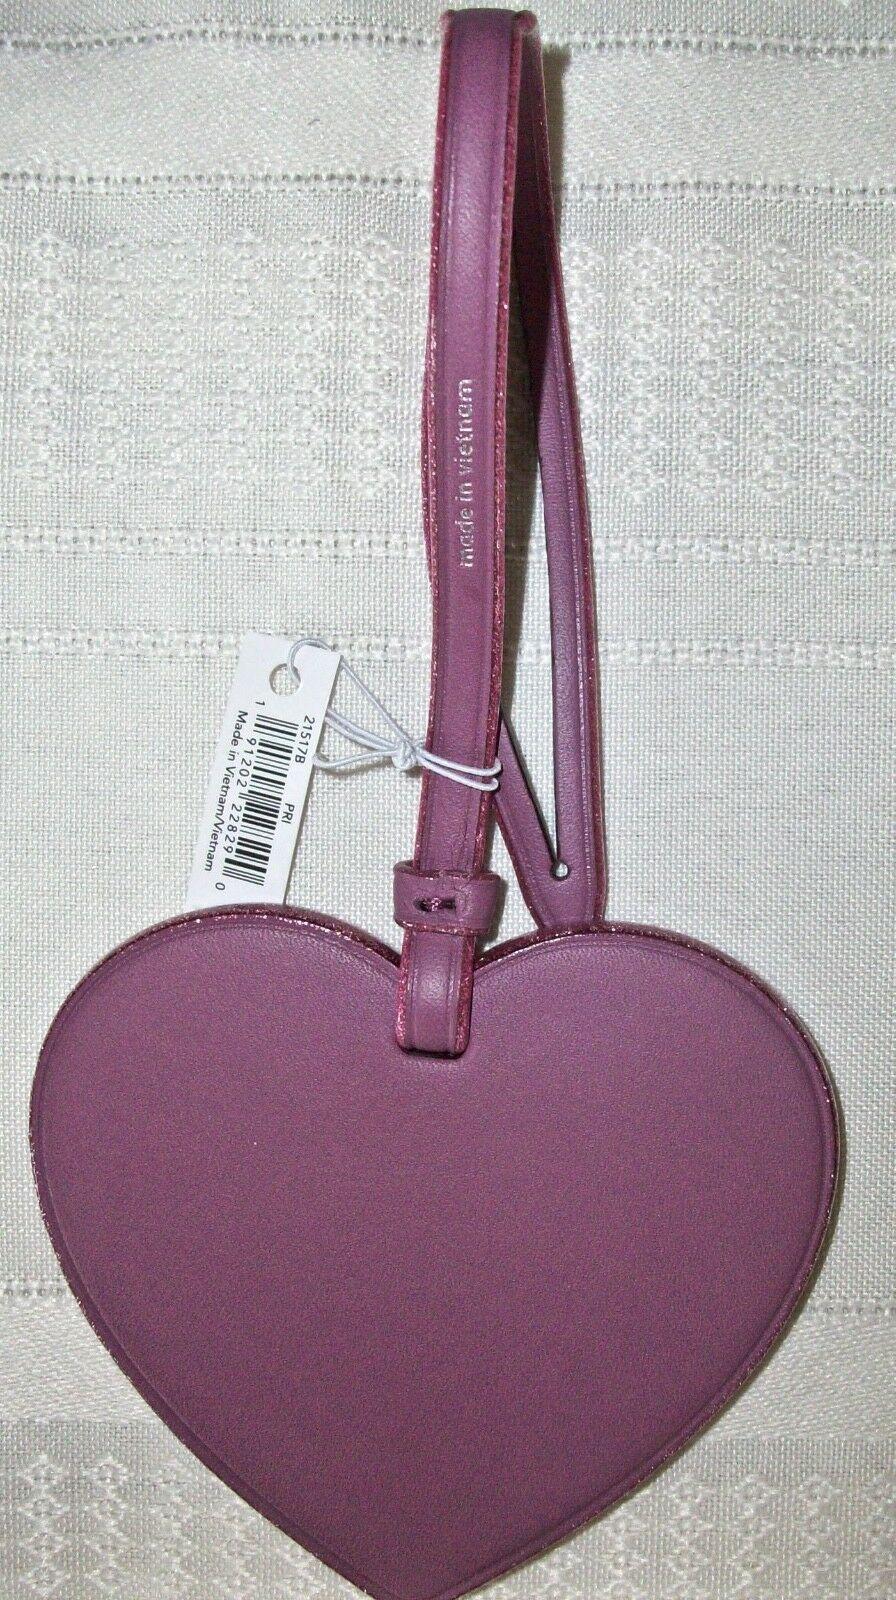 Coach Boxed Leather Heart Charm Ornament Glitter Edges 21517 NWT Primrose image 3